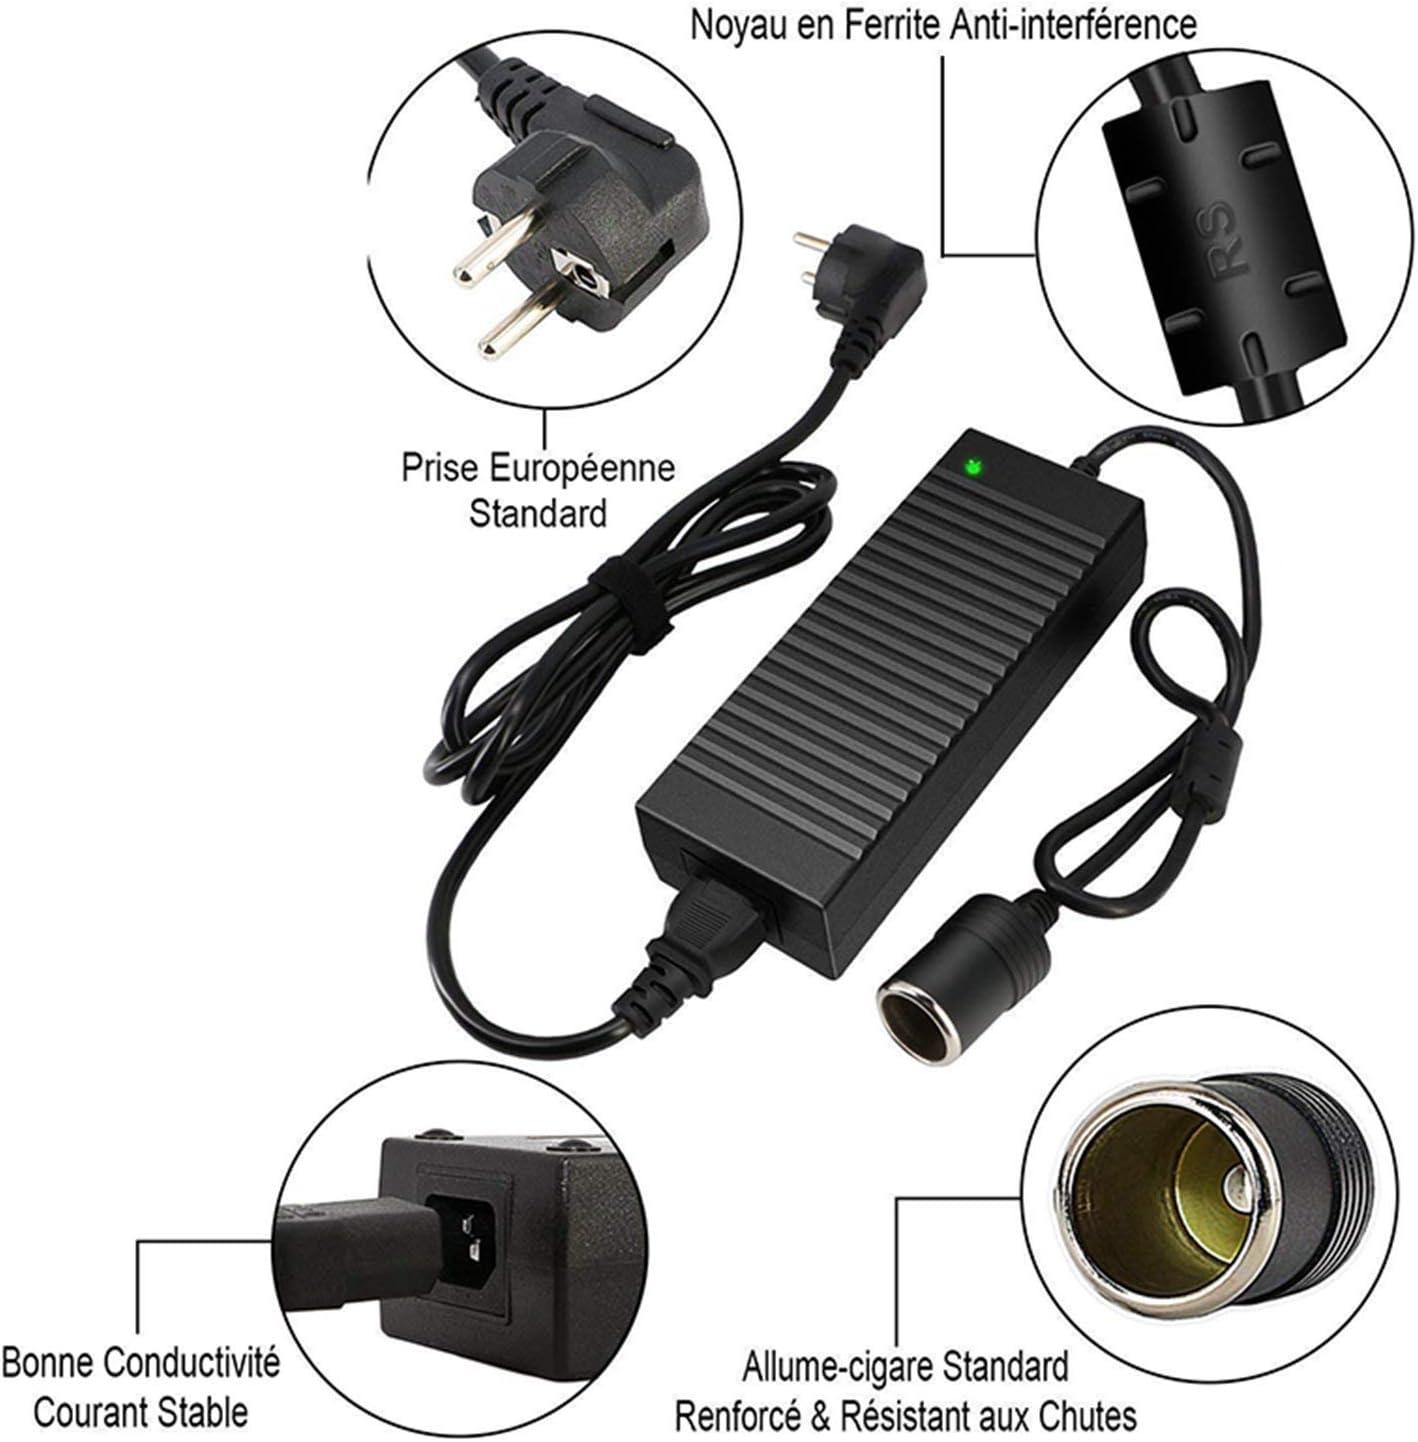 Fanuse Adaptador Corriente para Autom/óVil Transformador de Voltaje 100-220V 240V AC una 12V Adaptador de Red Enchufe de la UE 230 120W 12V 10A Adaptador Fuente Alimentaci/óN AC